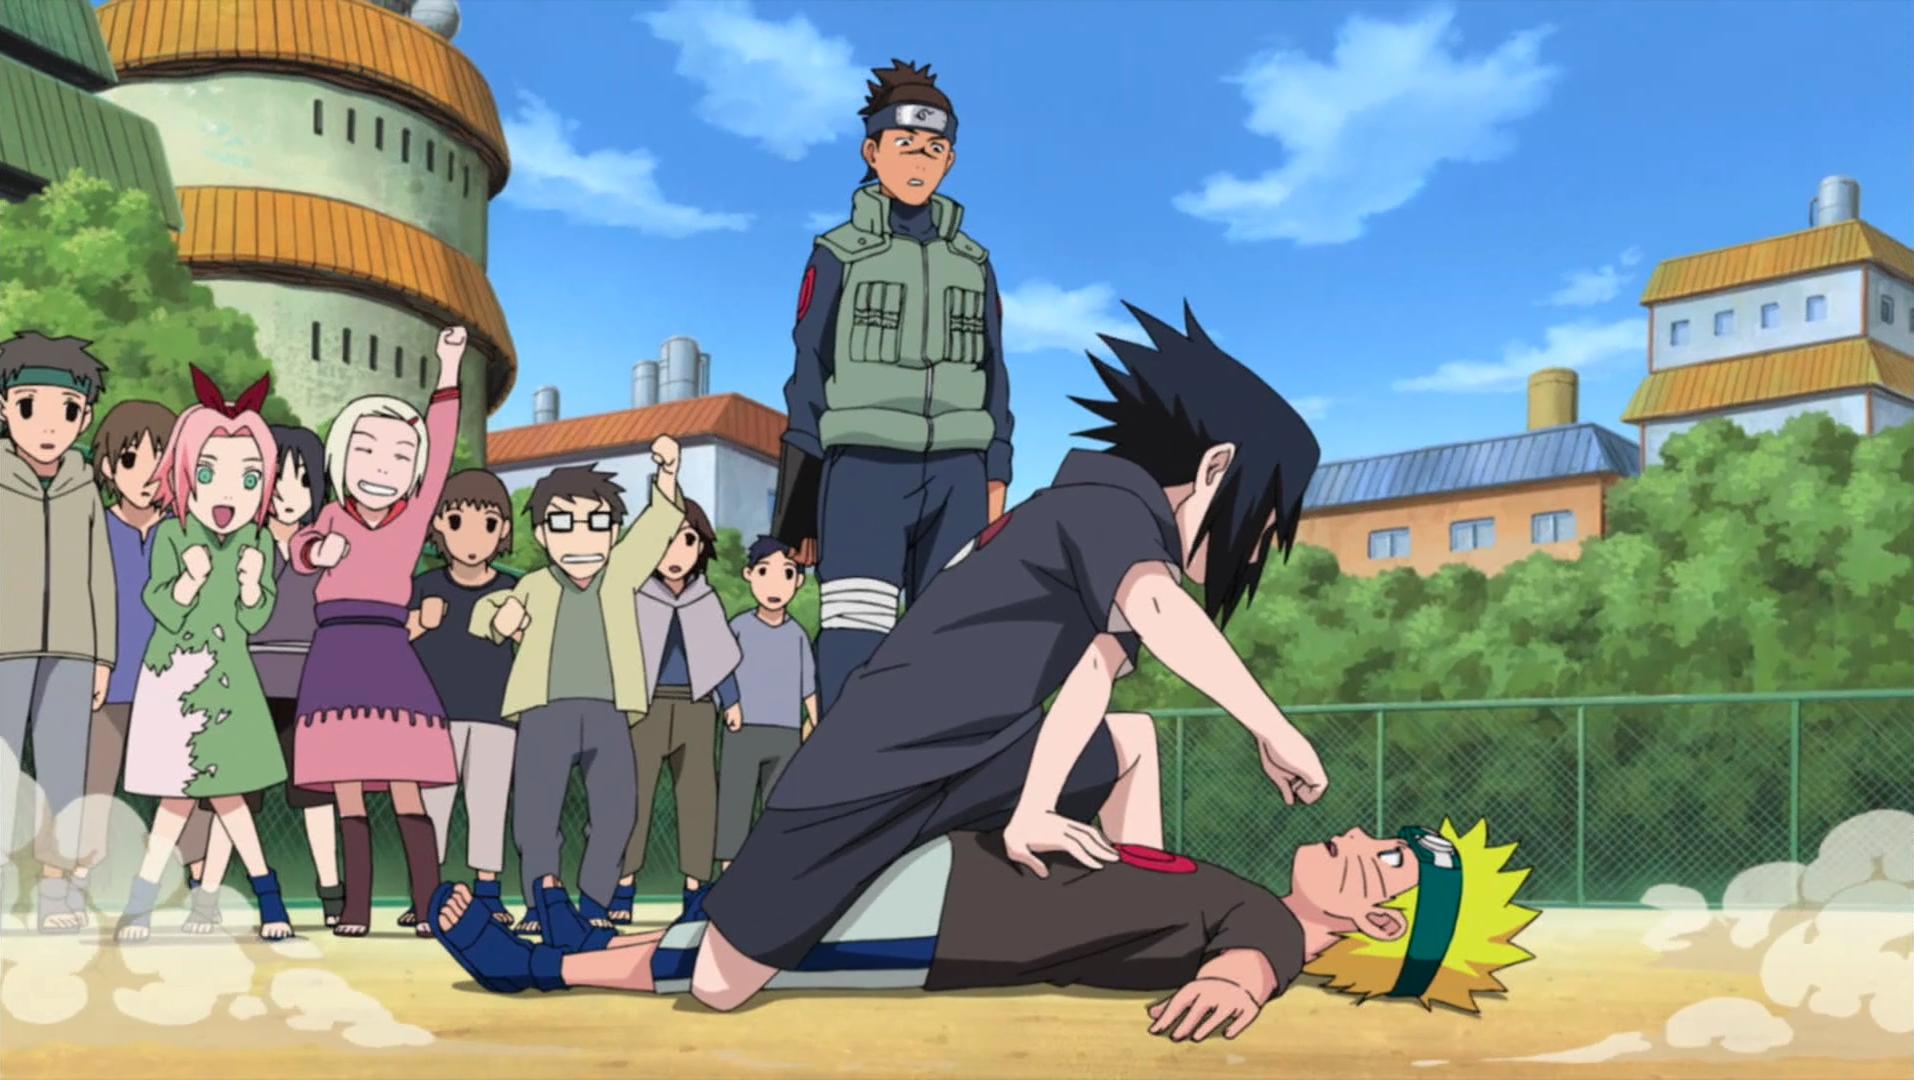 Meeting 257 narutopedia fandom powered by wikia - Naruto and sasuki ...